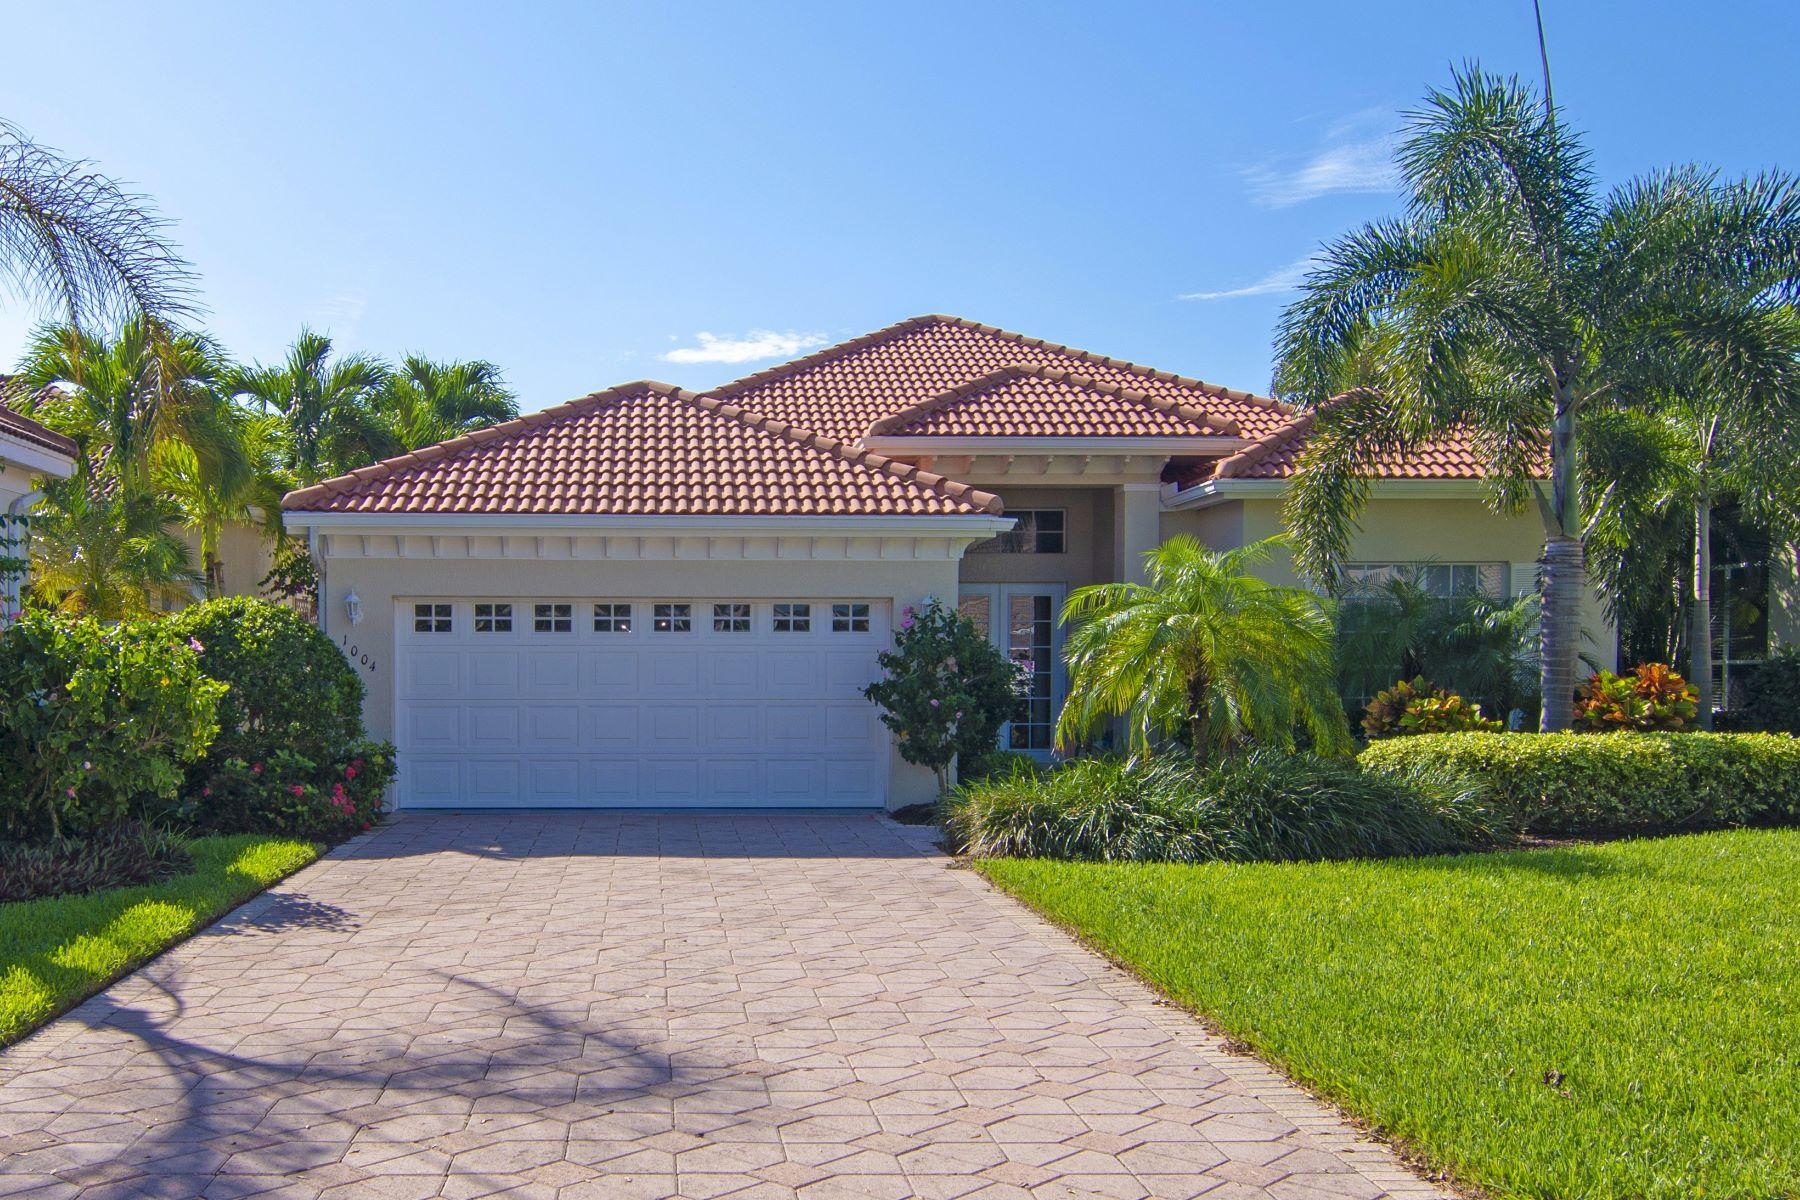 1004 Island Club Square 1004 Island Club Square Vero Beach, Florida 32963 Stati Uniti